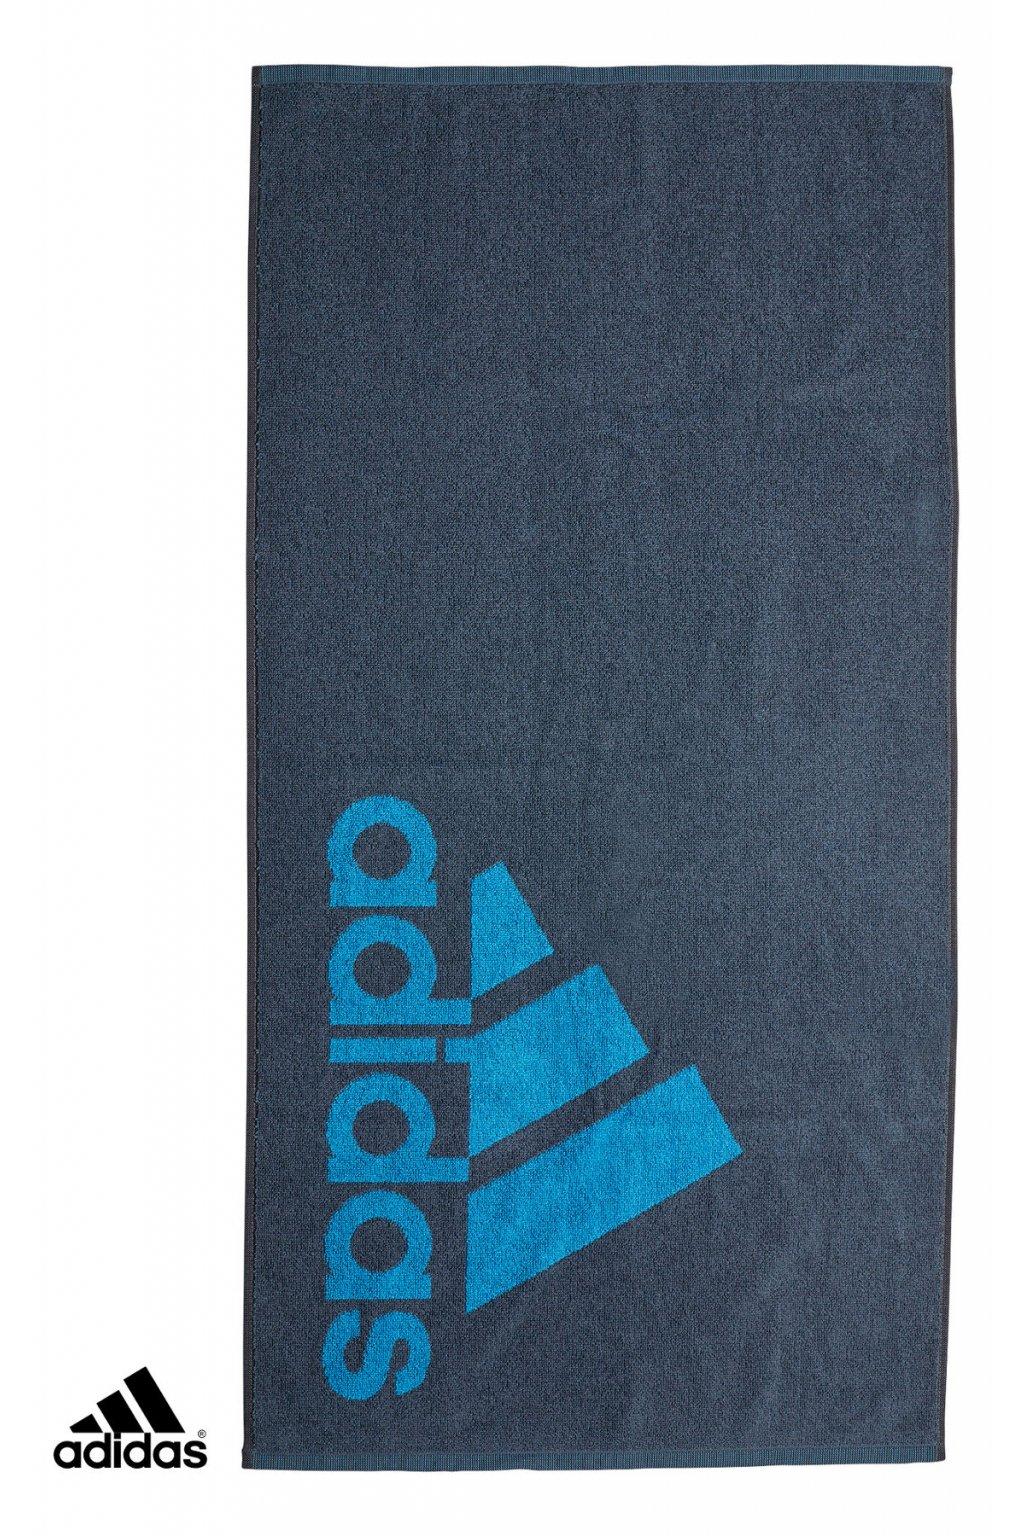 fj4775 uterak adidas towel velkost s